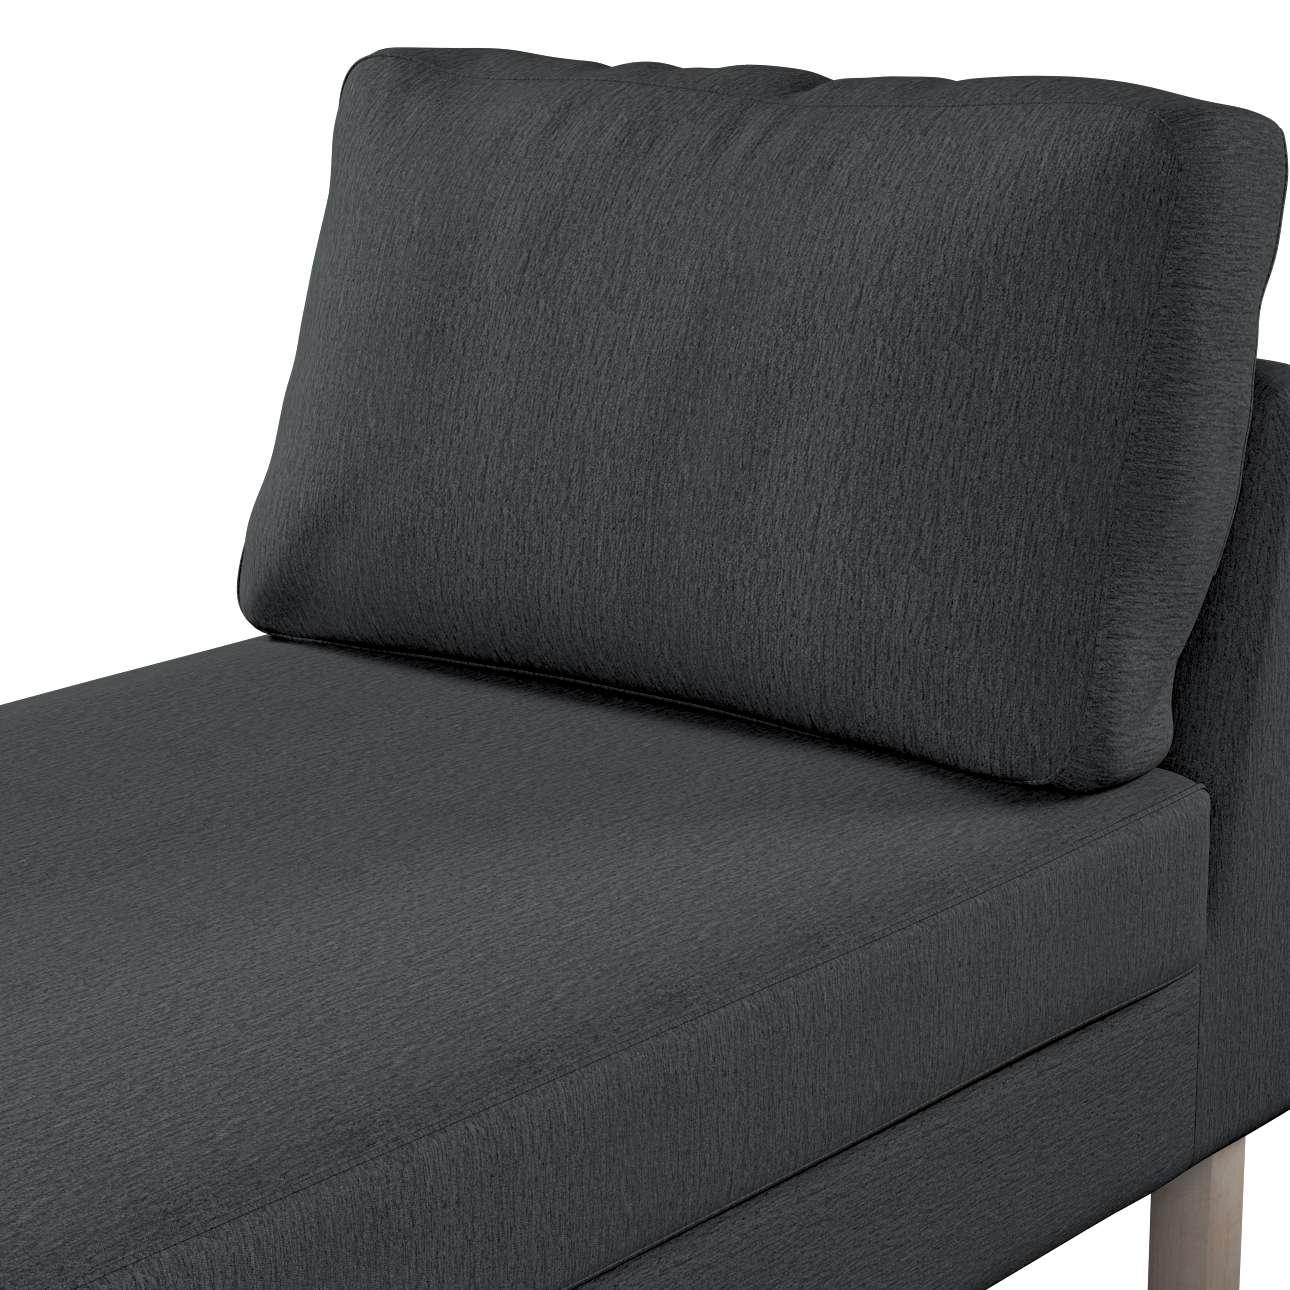 Zitbankhoes, Karlstad chaise longue van de collectie Chenille, Stof: 702-20